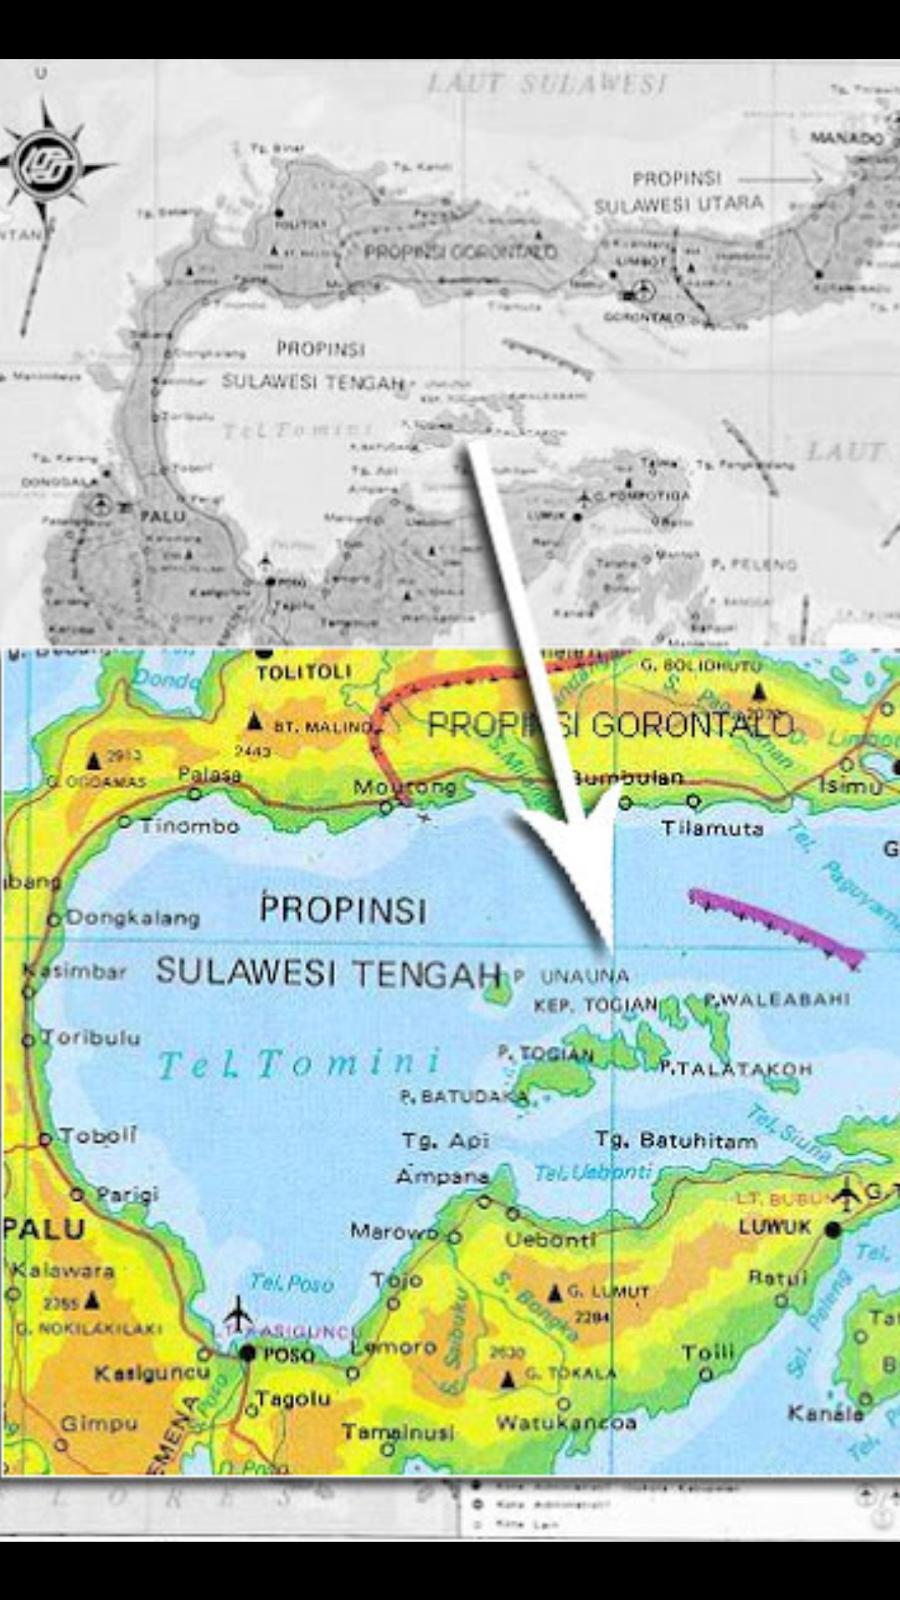 Pesona Teluk Tomini Togean Islands Koh Sumin Nikmati Keindahan Sulawesi